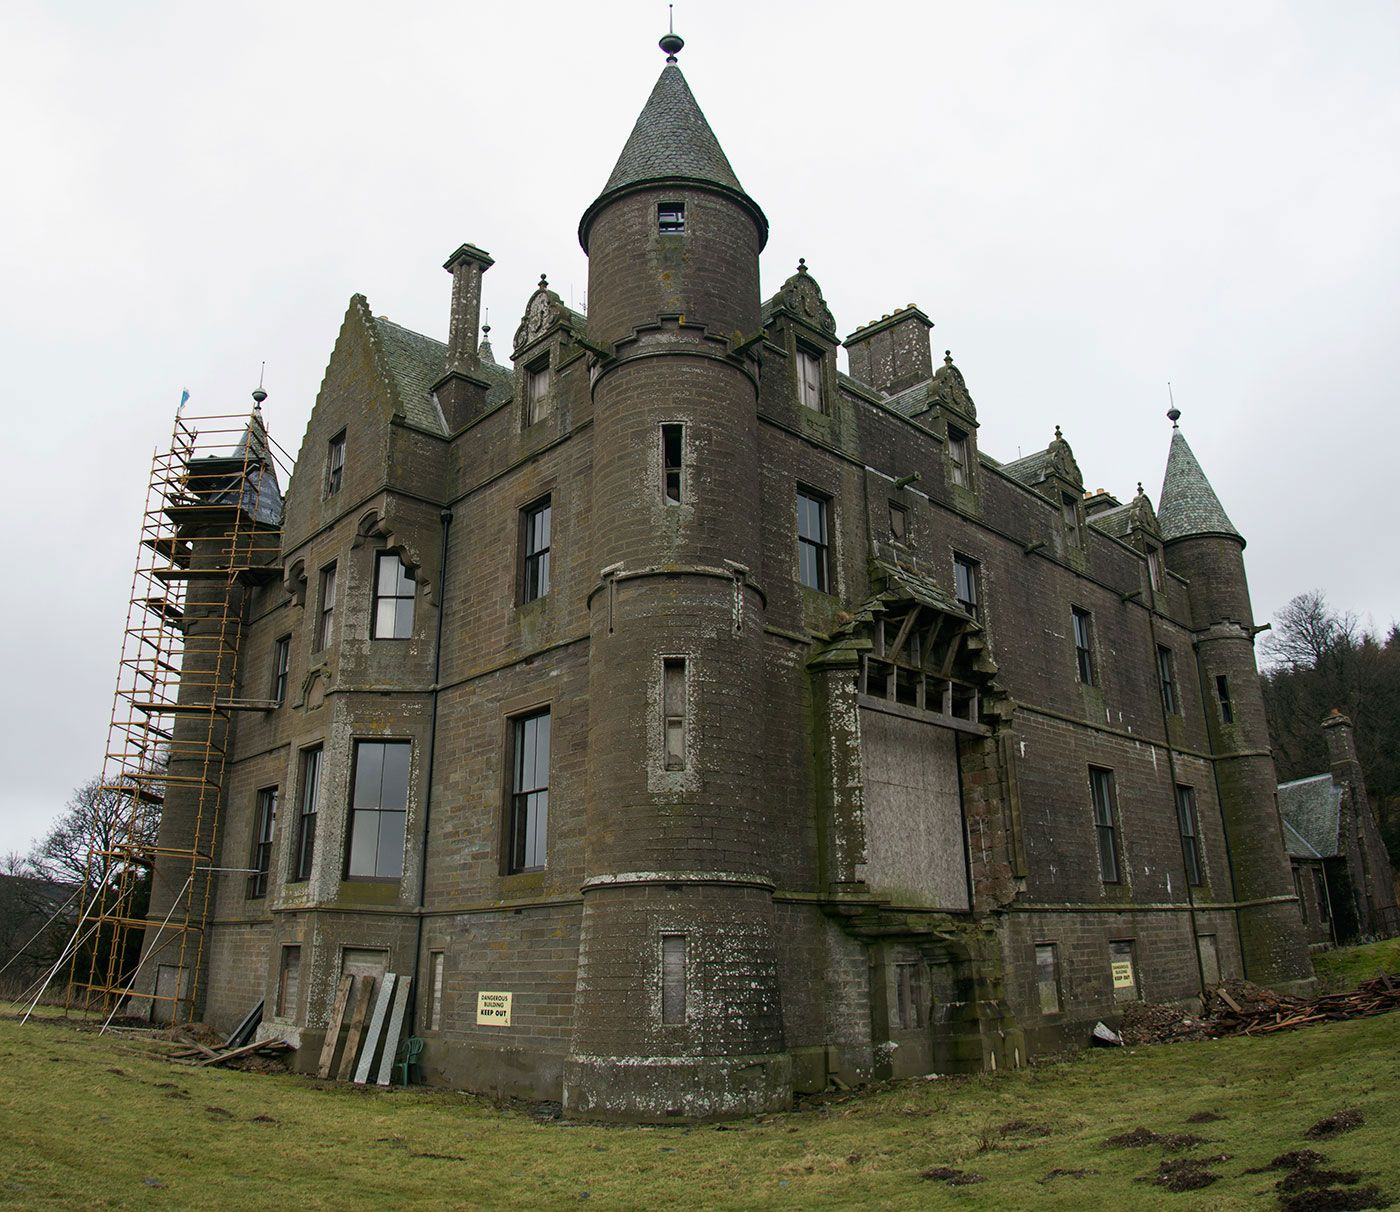 Balintore Castle - A Restoration Project